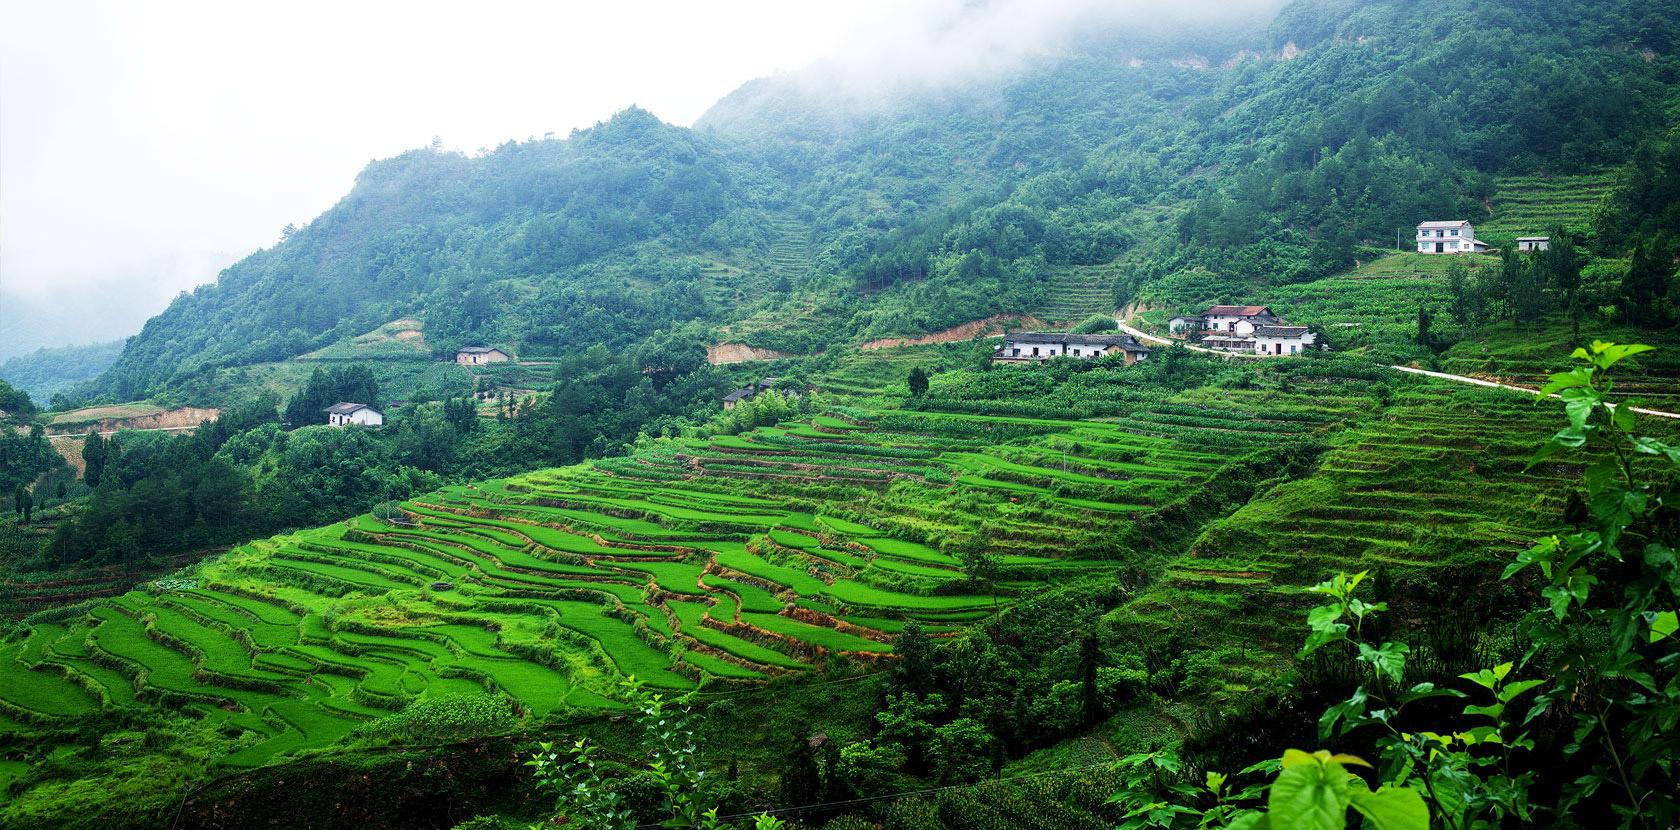 900LH.COM Panlong Mountain Base, Shaanxi, China